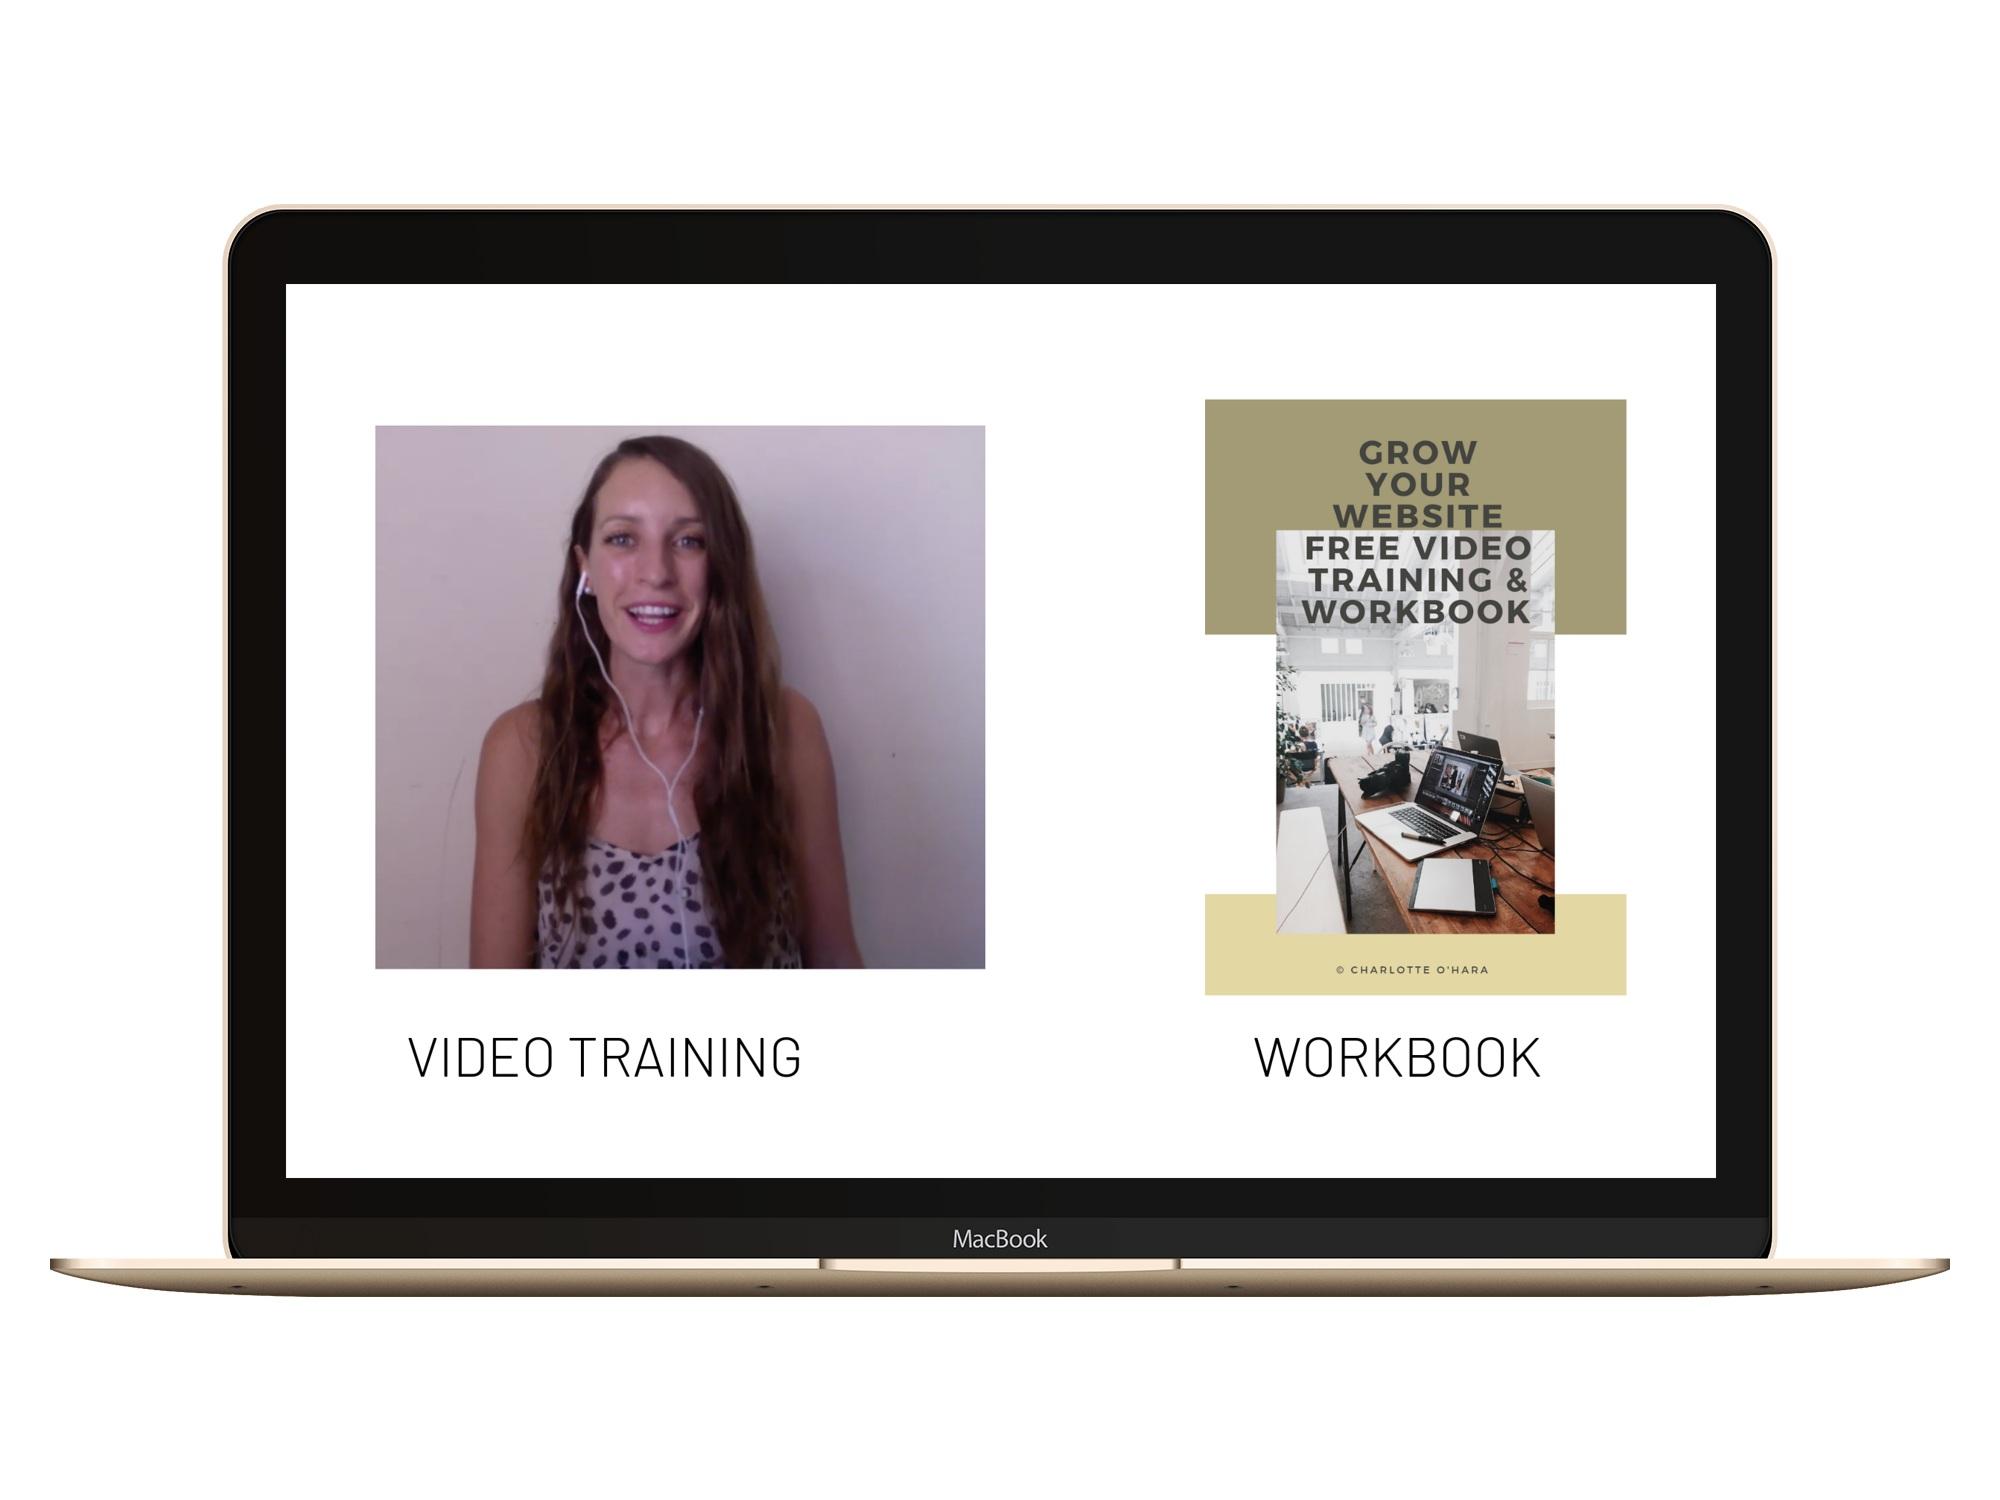 Grow+your+website+video+training